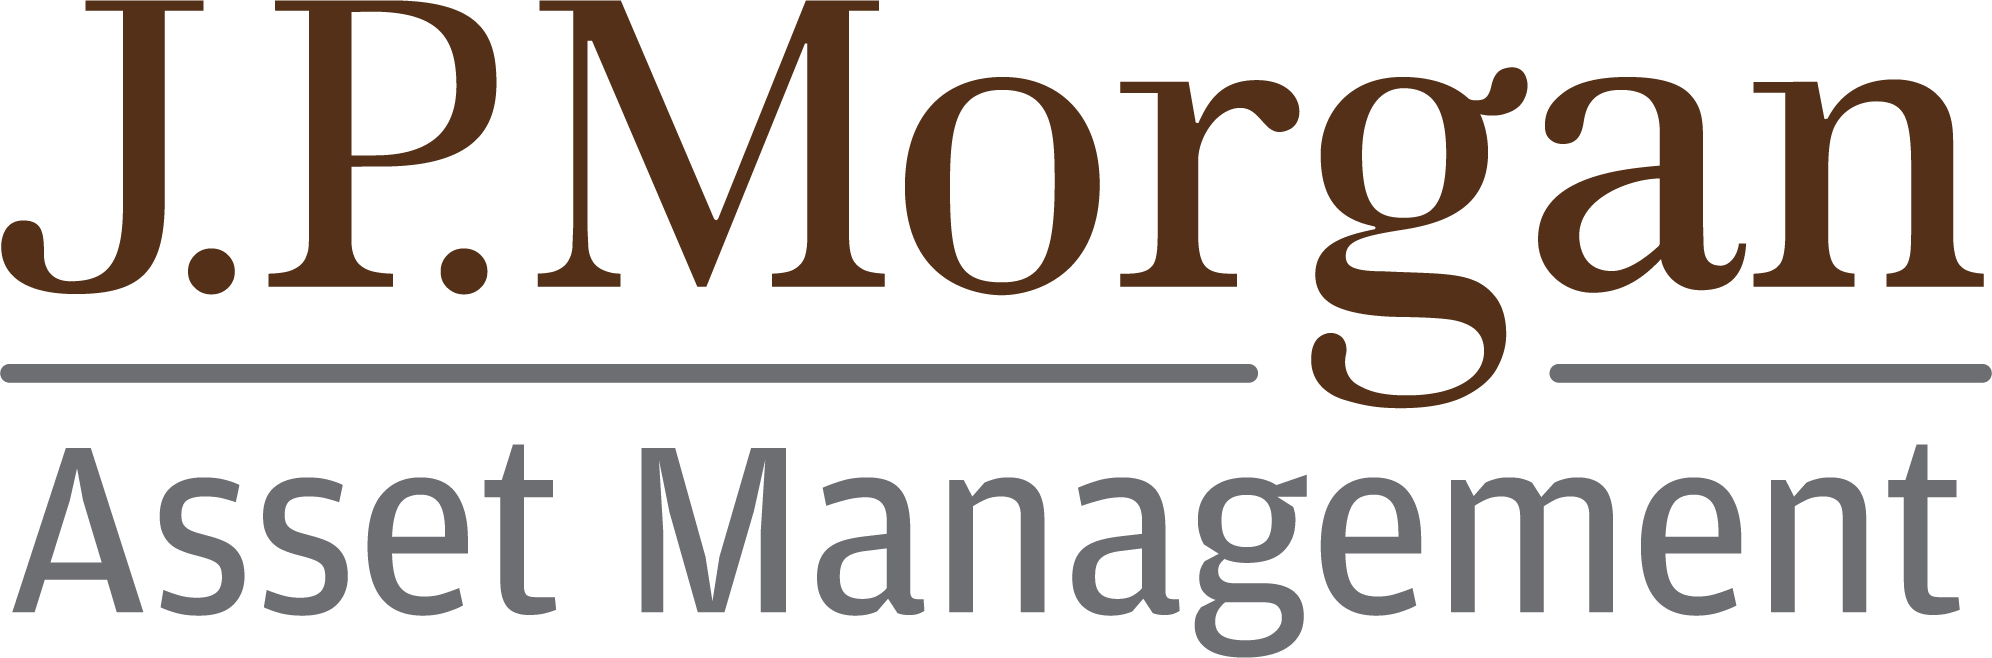 JPMorgan1